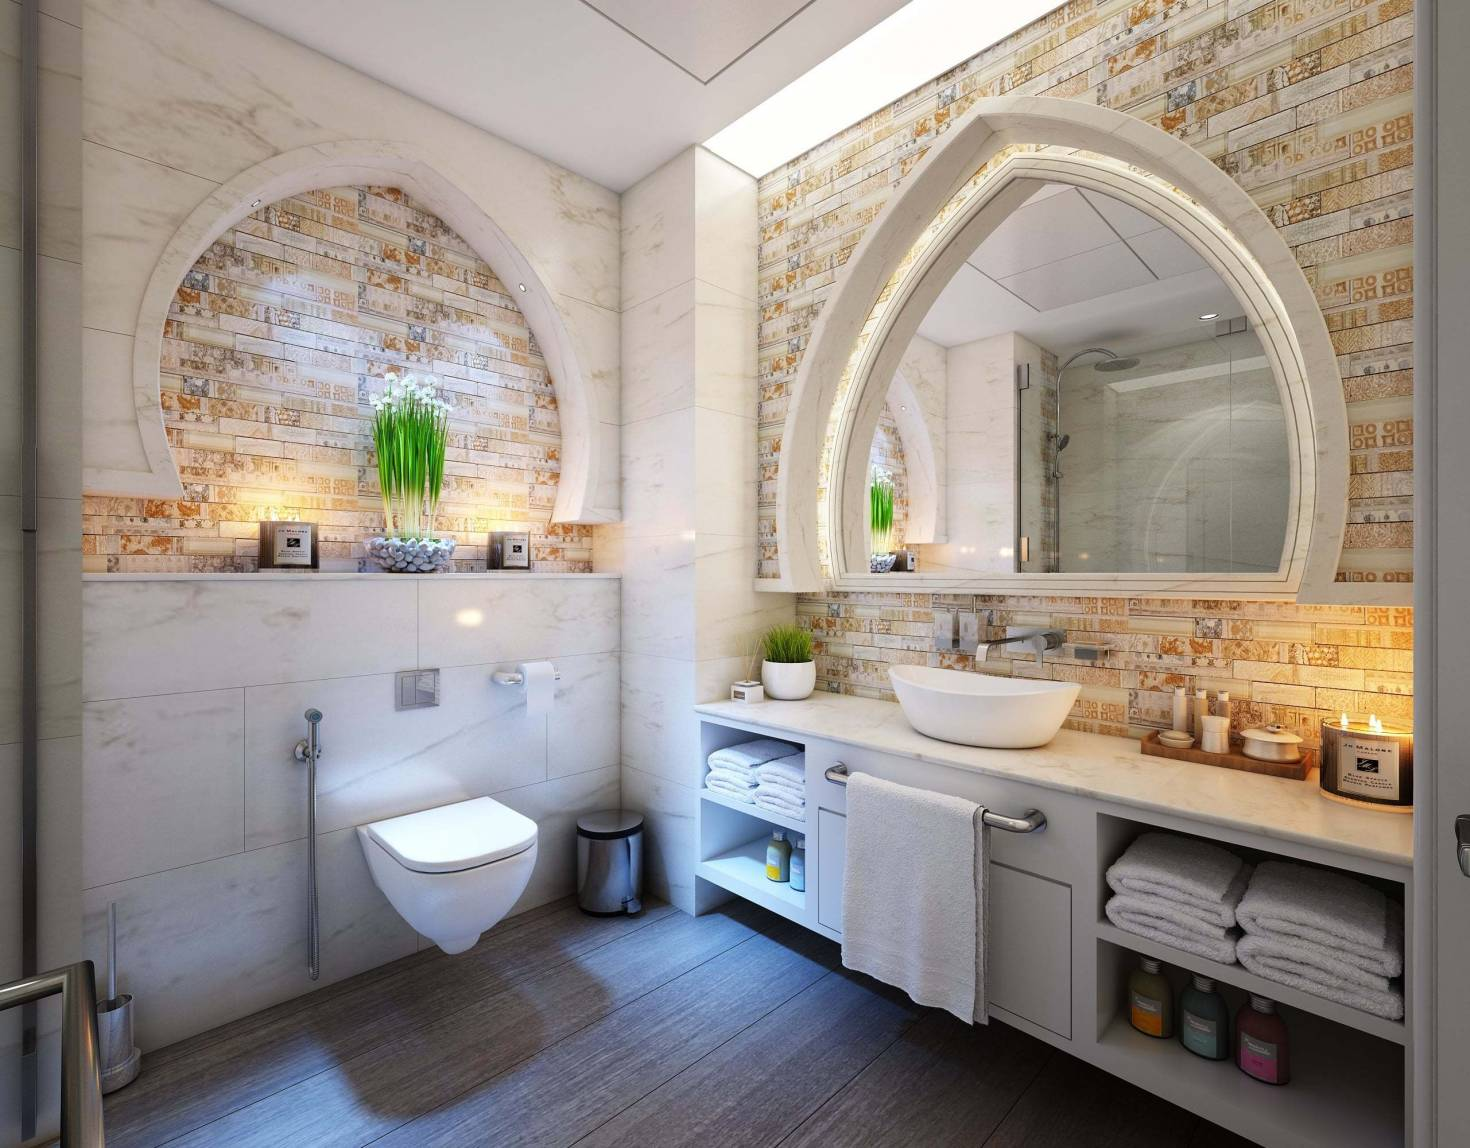 Architecturally Designed Bathroom